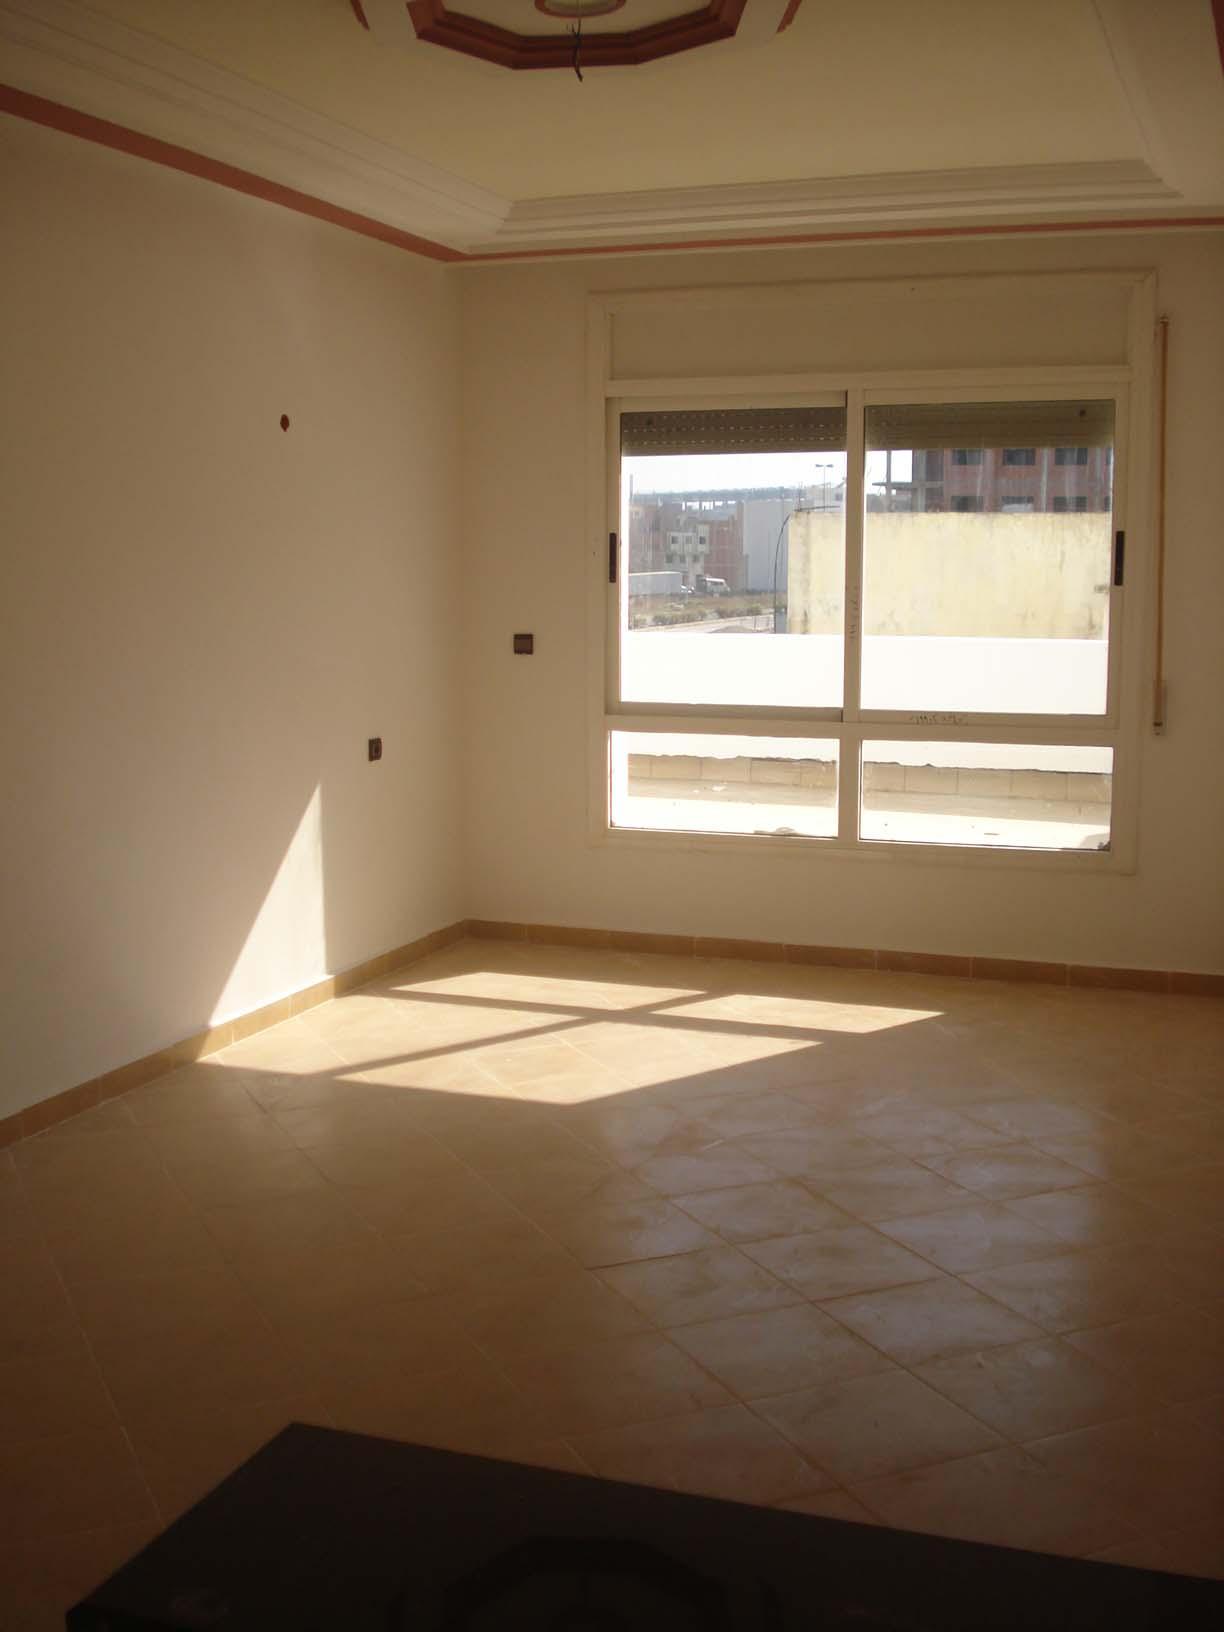 Vente appartement à tanger maroc moyen standing appartement à ...